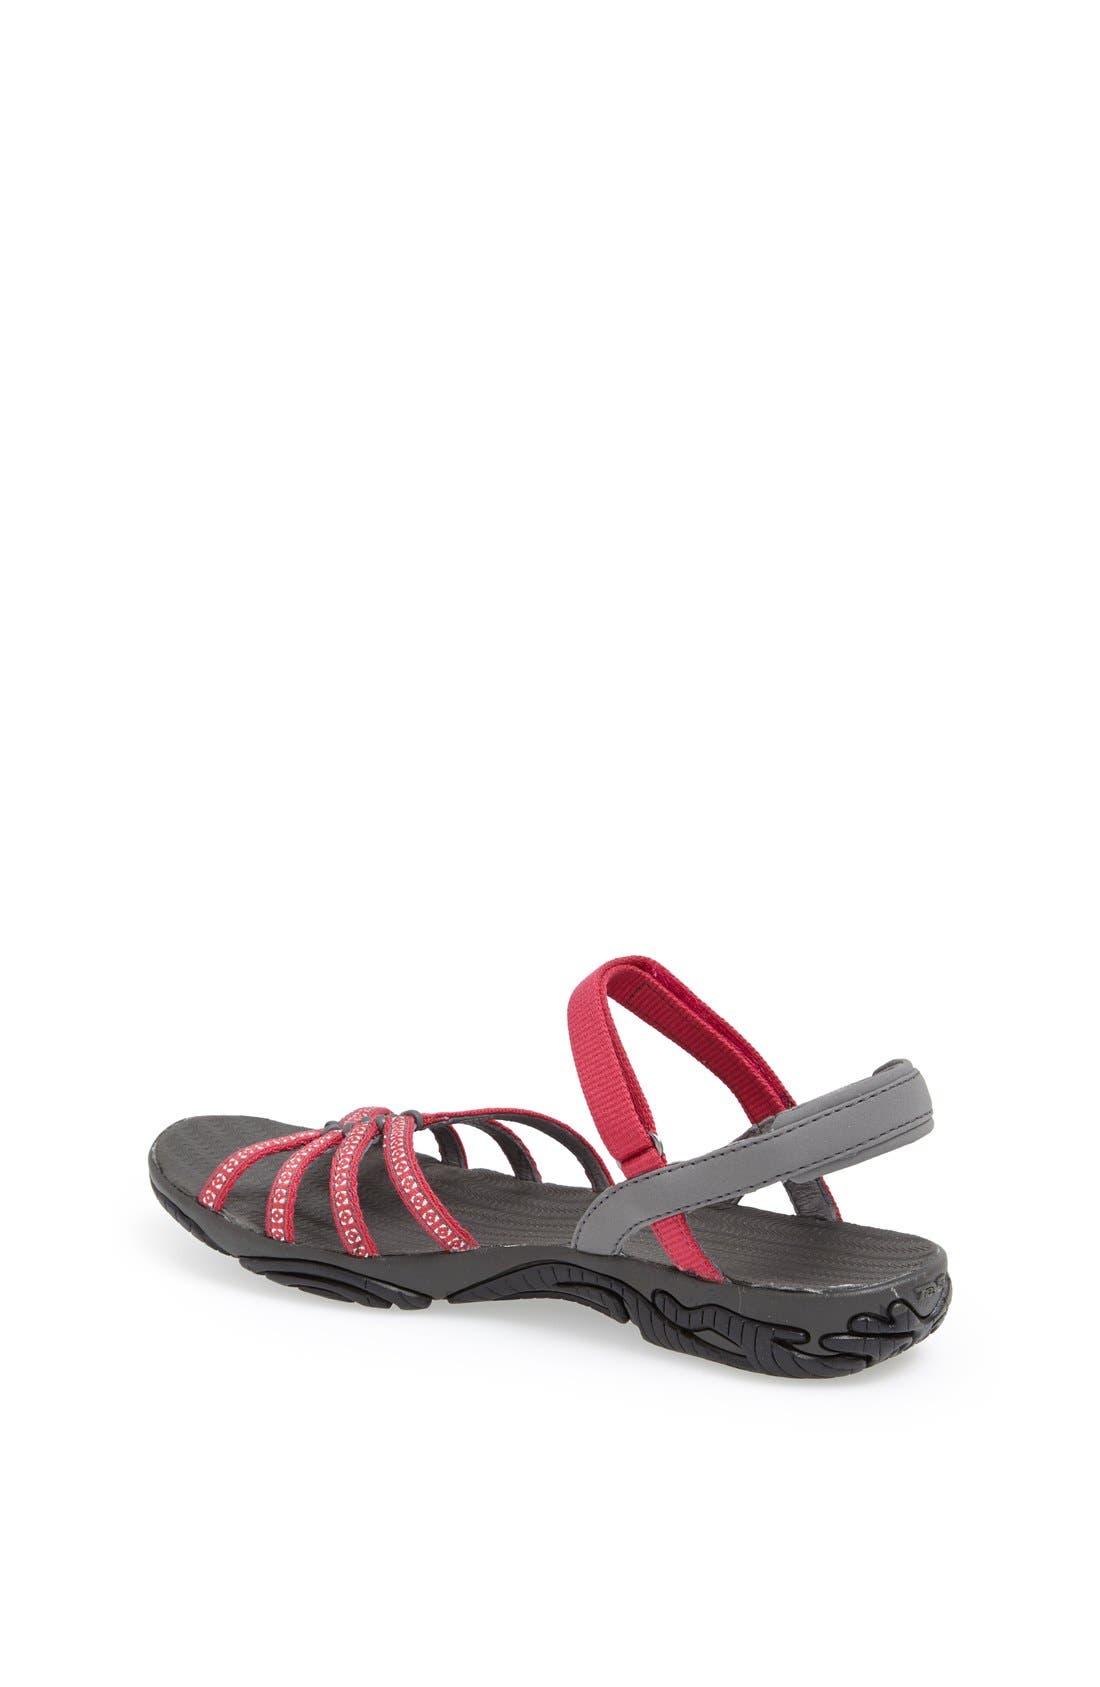 Alternate Image 2  - Teva 'Kayenta' Sandal